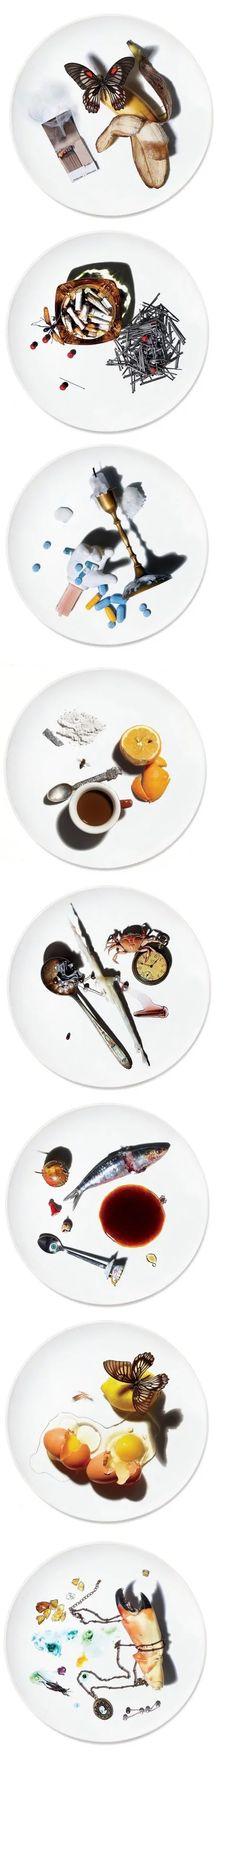 LOVE IT - Patella Brothers Plates,